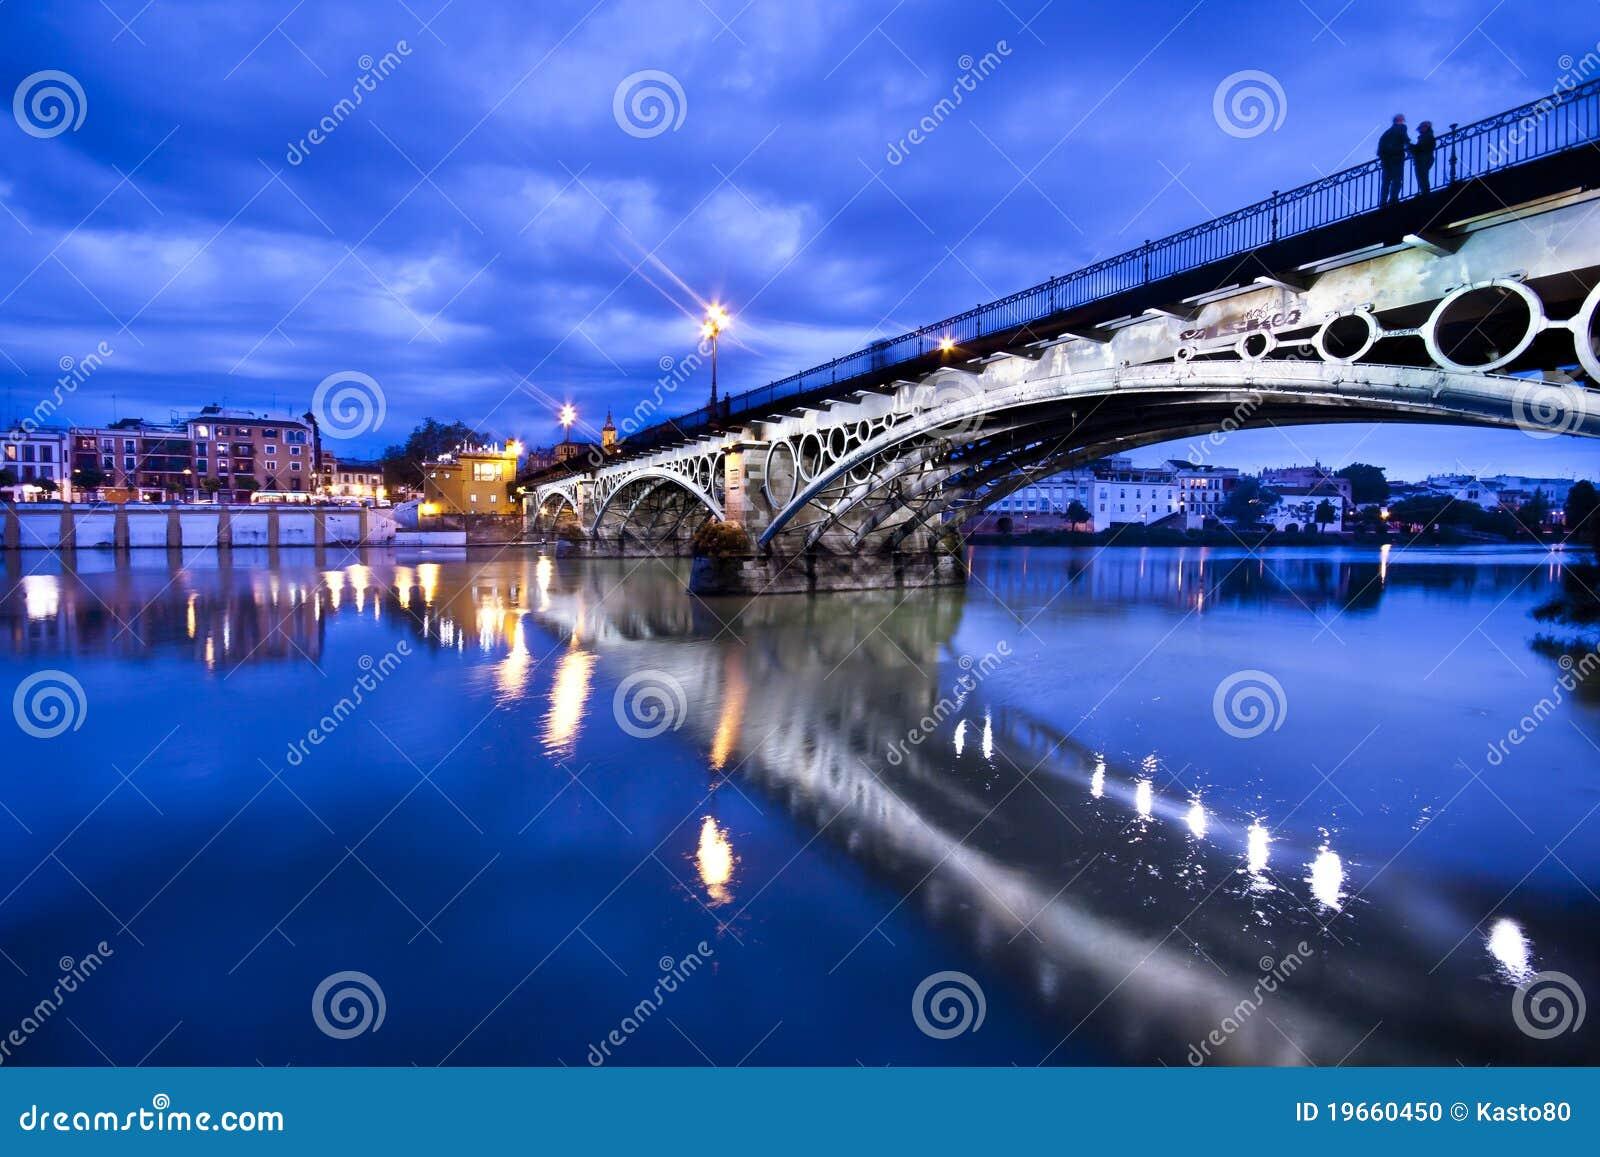 Sevillie, romantic panorama of the riverside